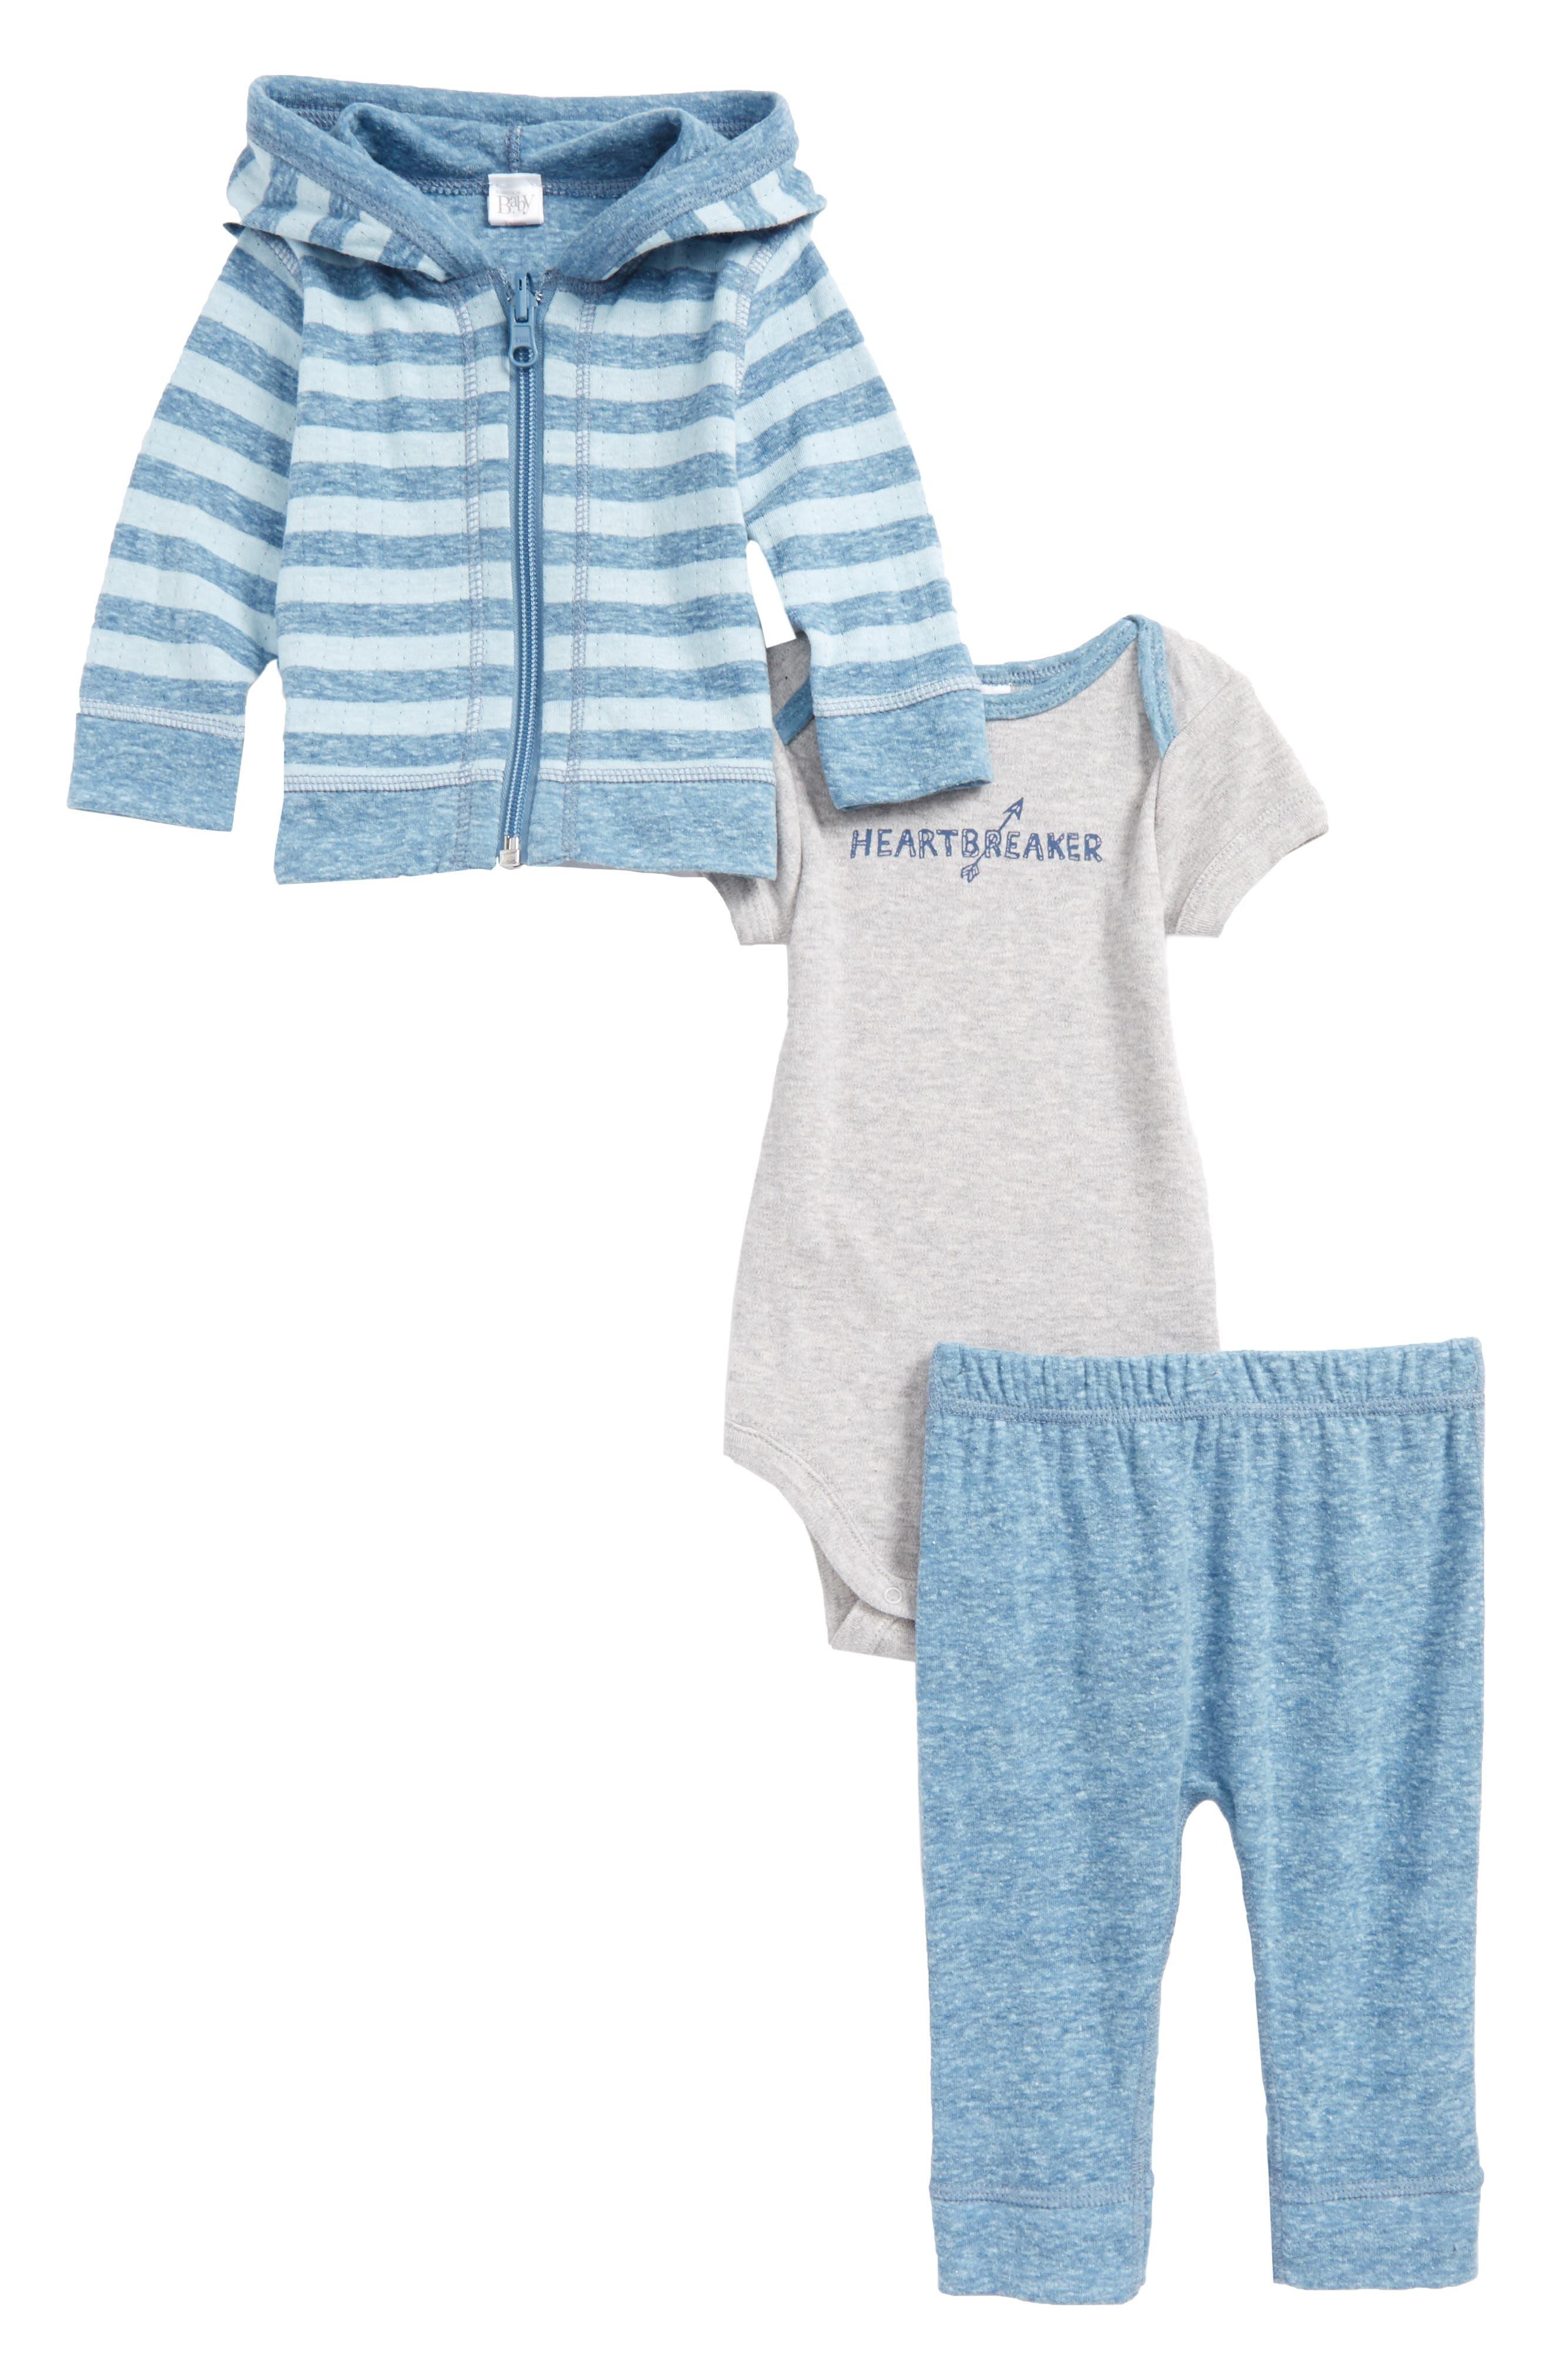 NORDSTROM BABY Reversible Zip Hoodie, Bodysuit & Pants Set, Main, color, 401